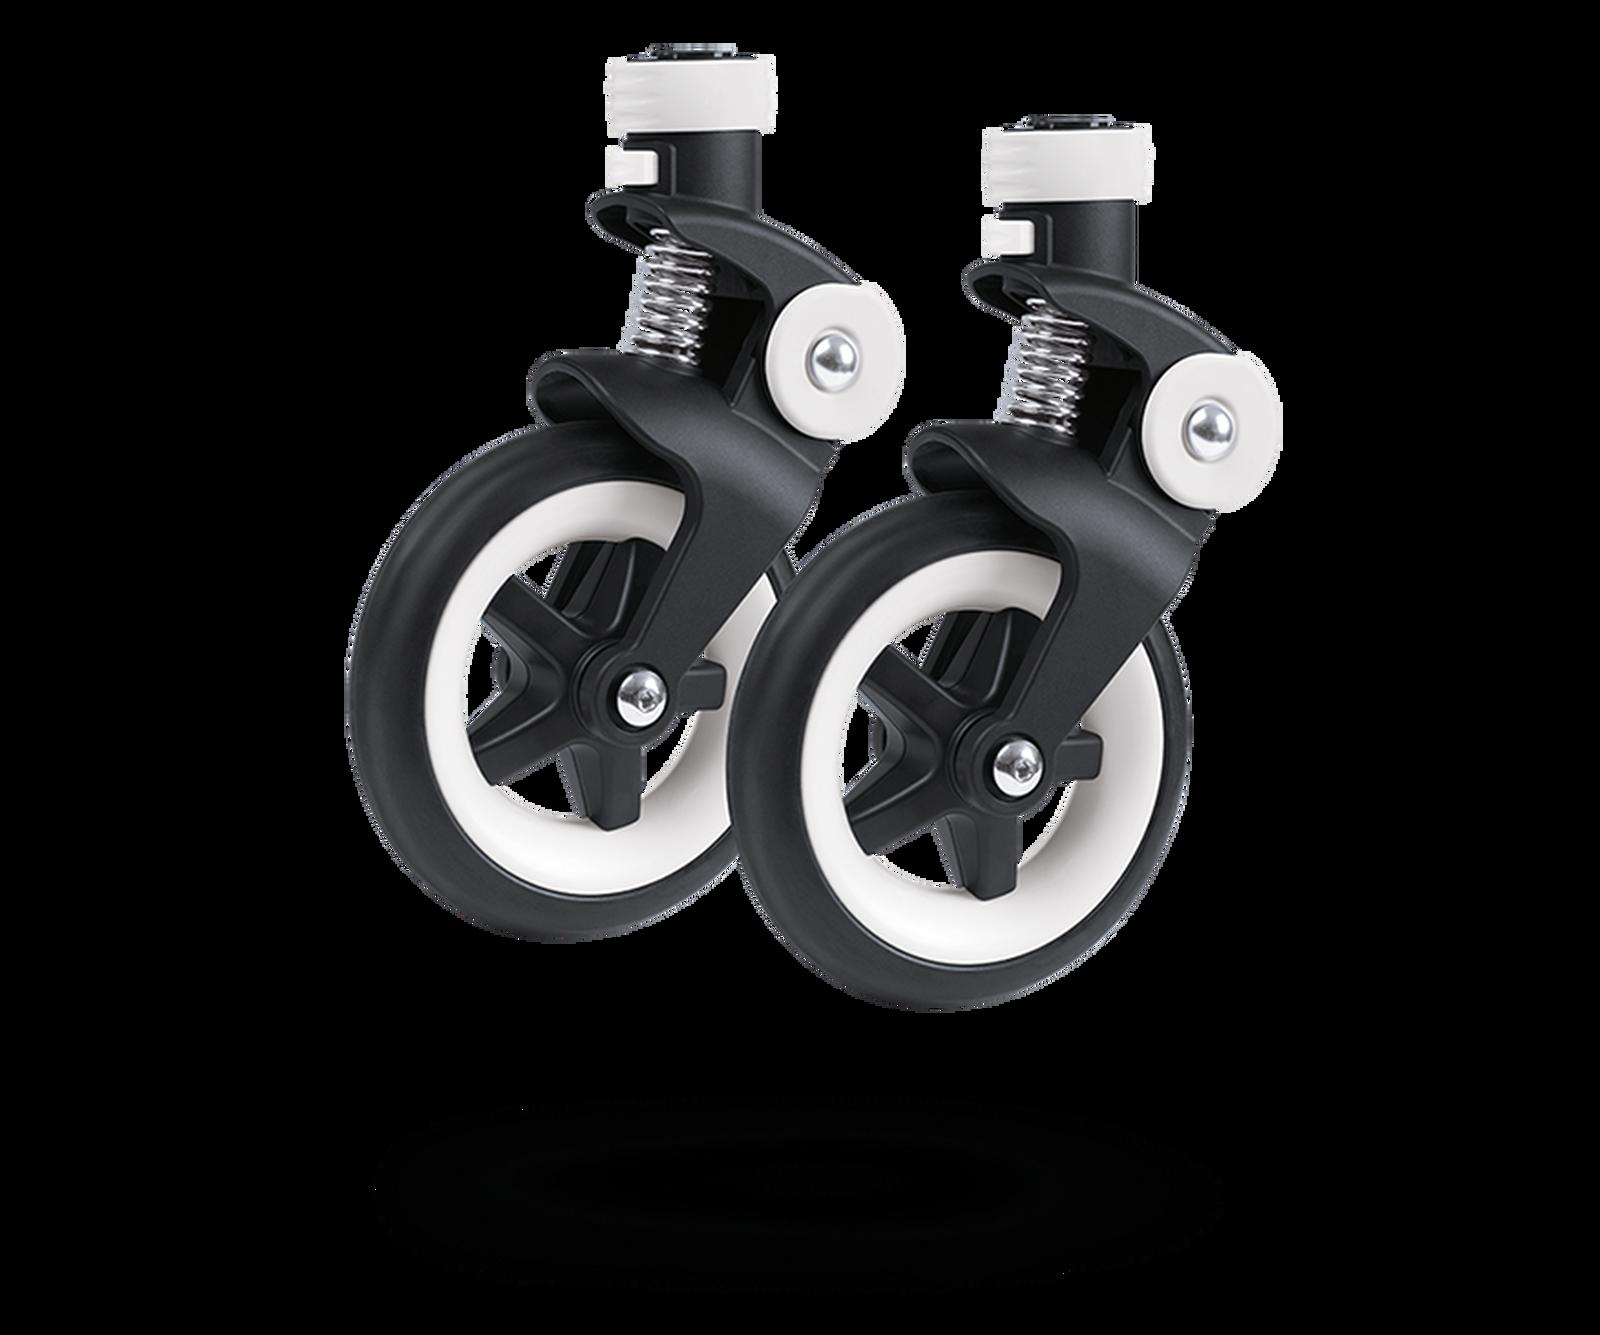 Bugaboo Bee 3 swivel wheels replacement set Black